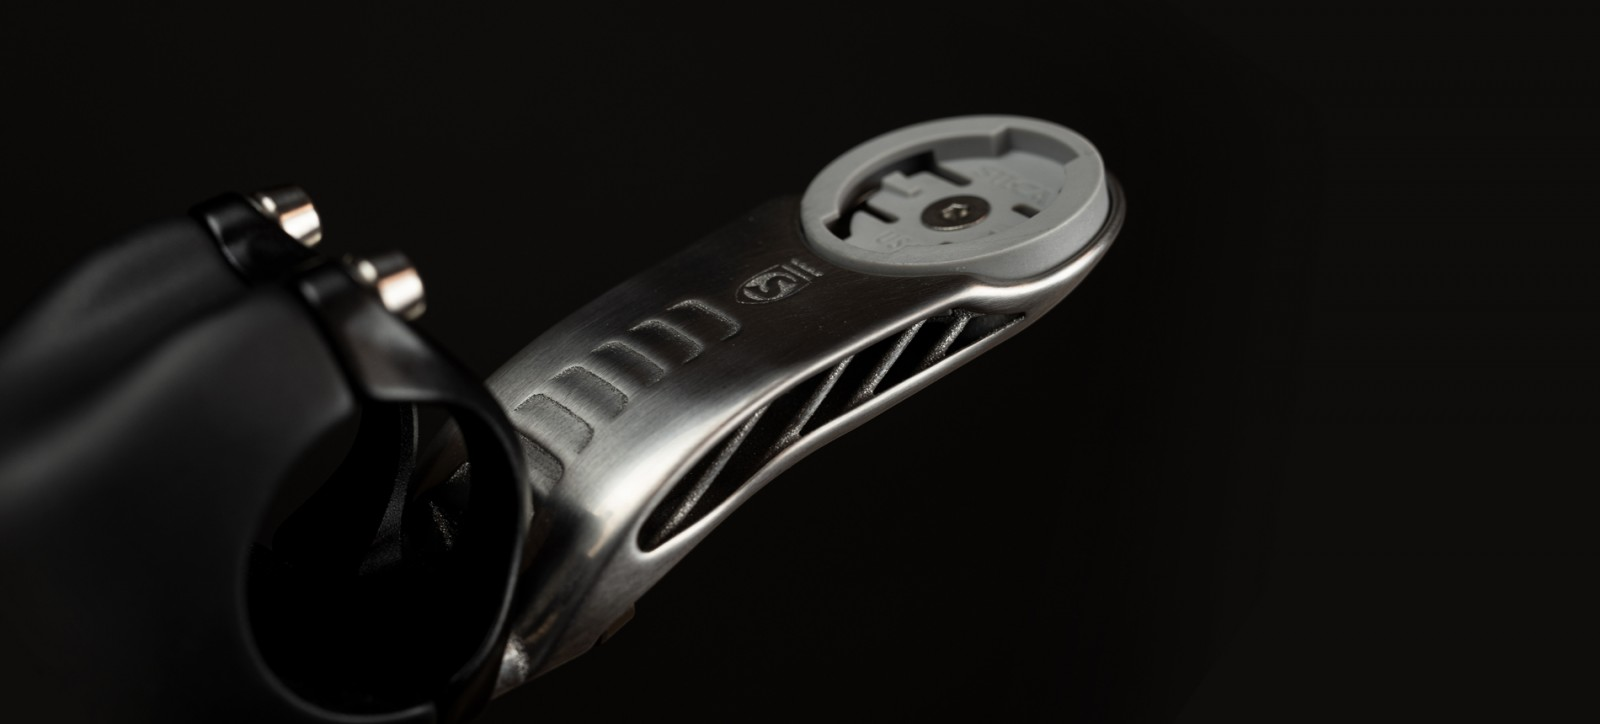 silca-mensola-soporte-titanio-gps/